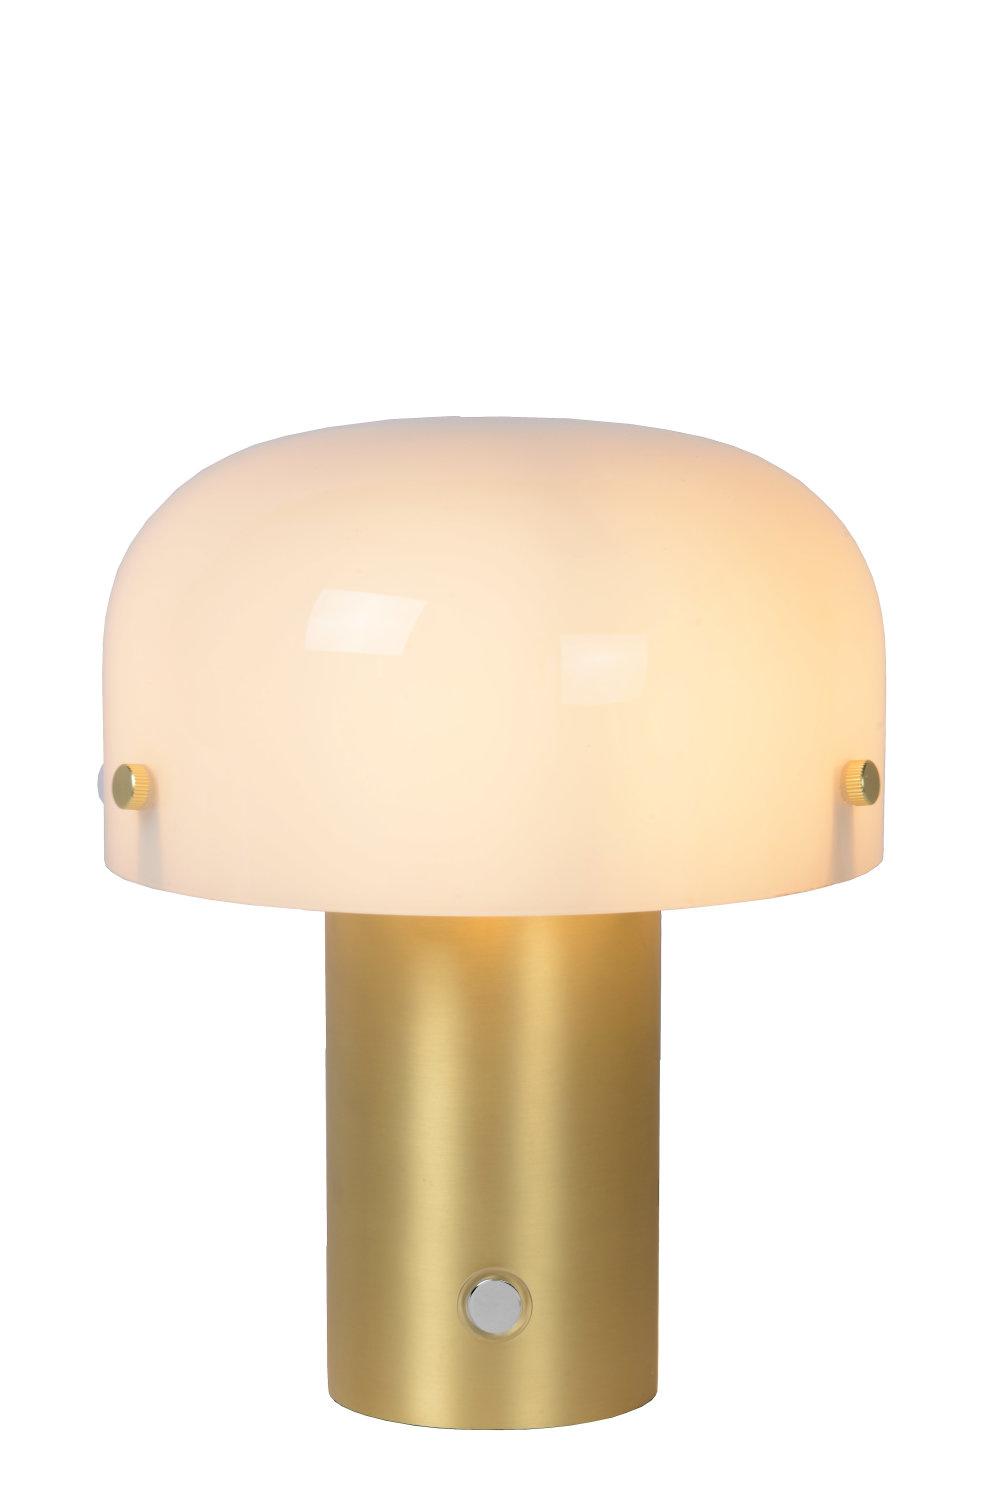 Lucide TIMON Tafellamp-Mat Go.-1xE14-25W-3 StepDim-Glas